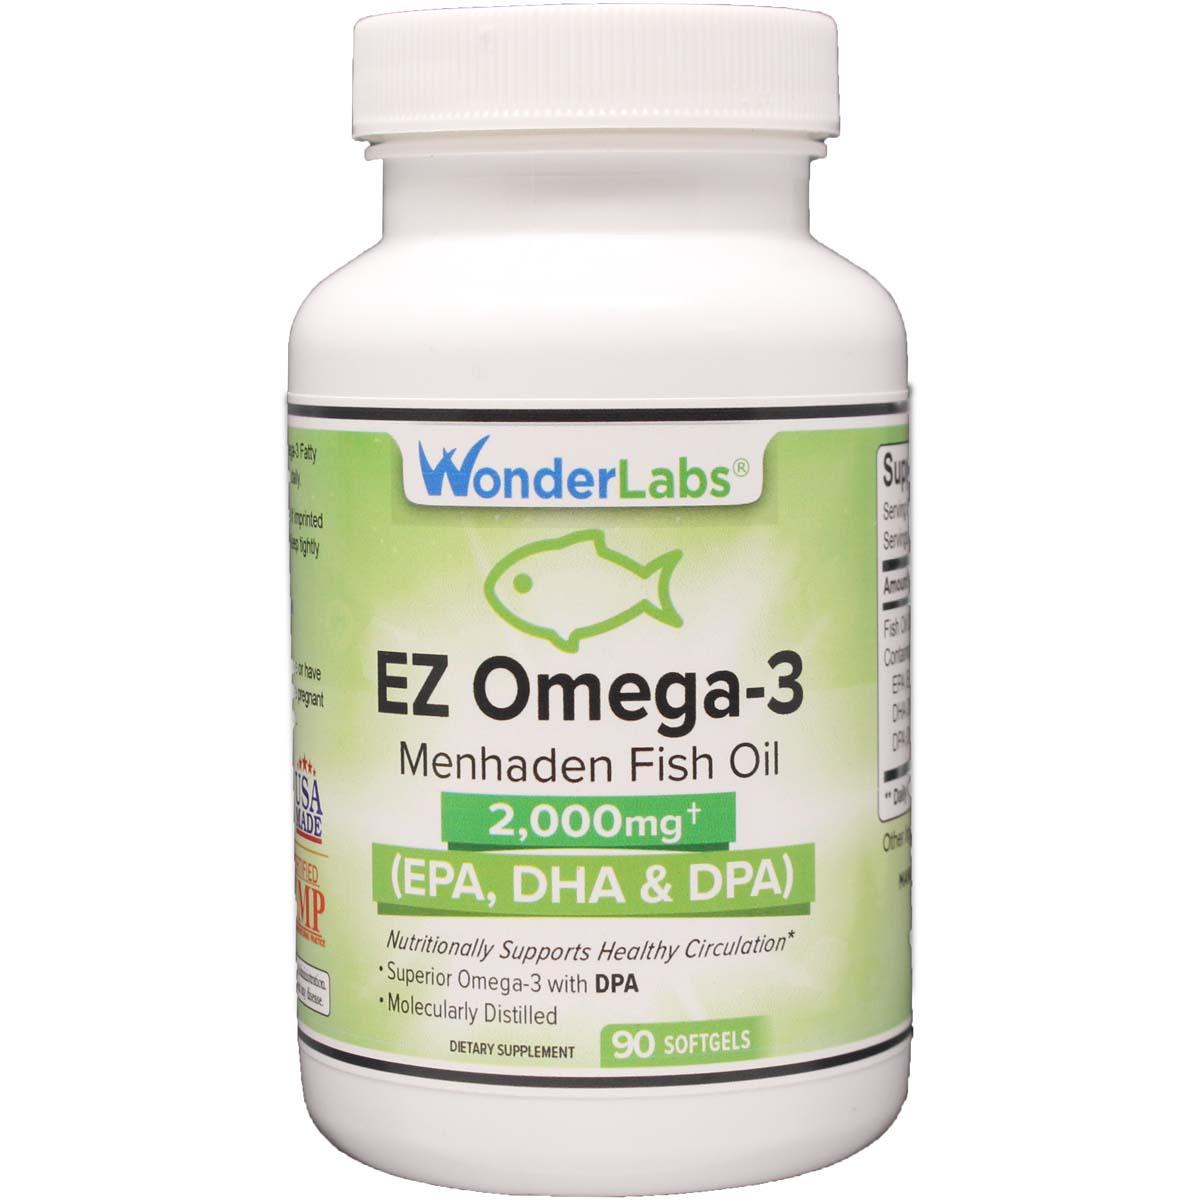 Ez omega 3 2000 mg dpa epa dha 90 softgels item 5321 for Menhaden fish meal